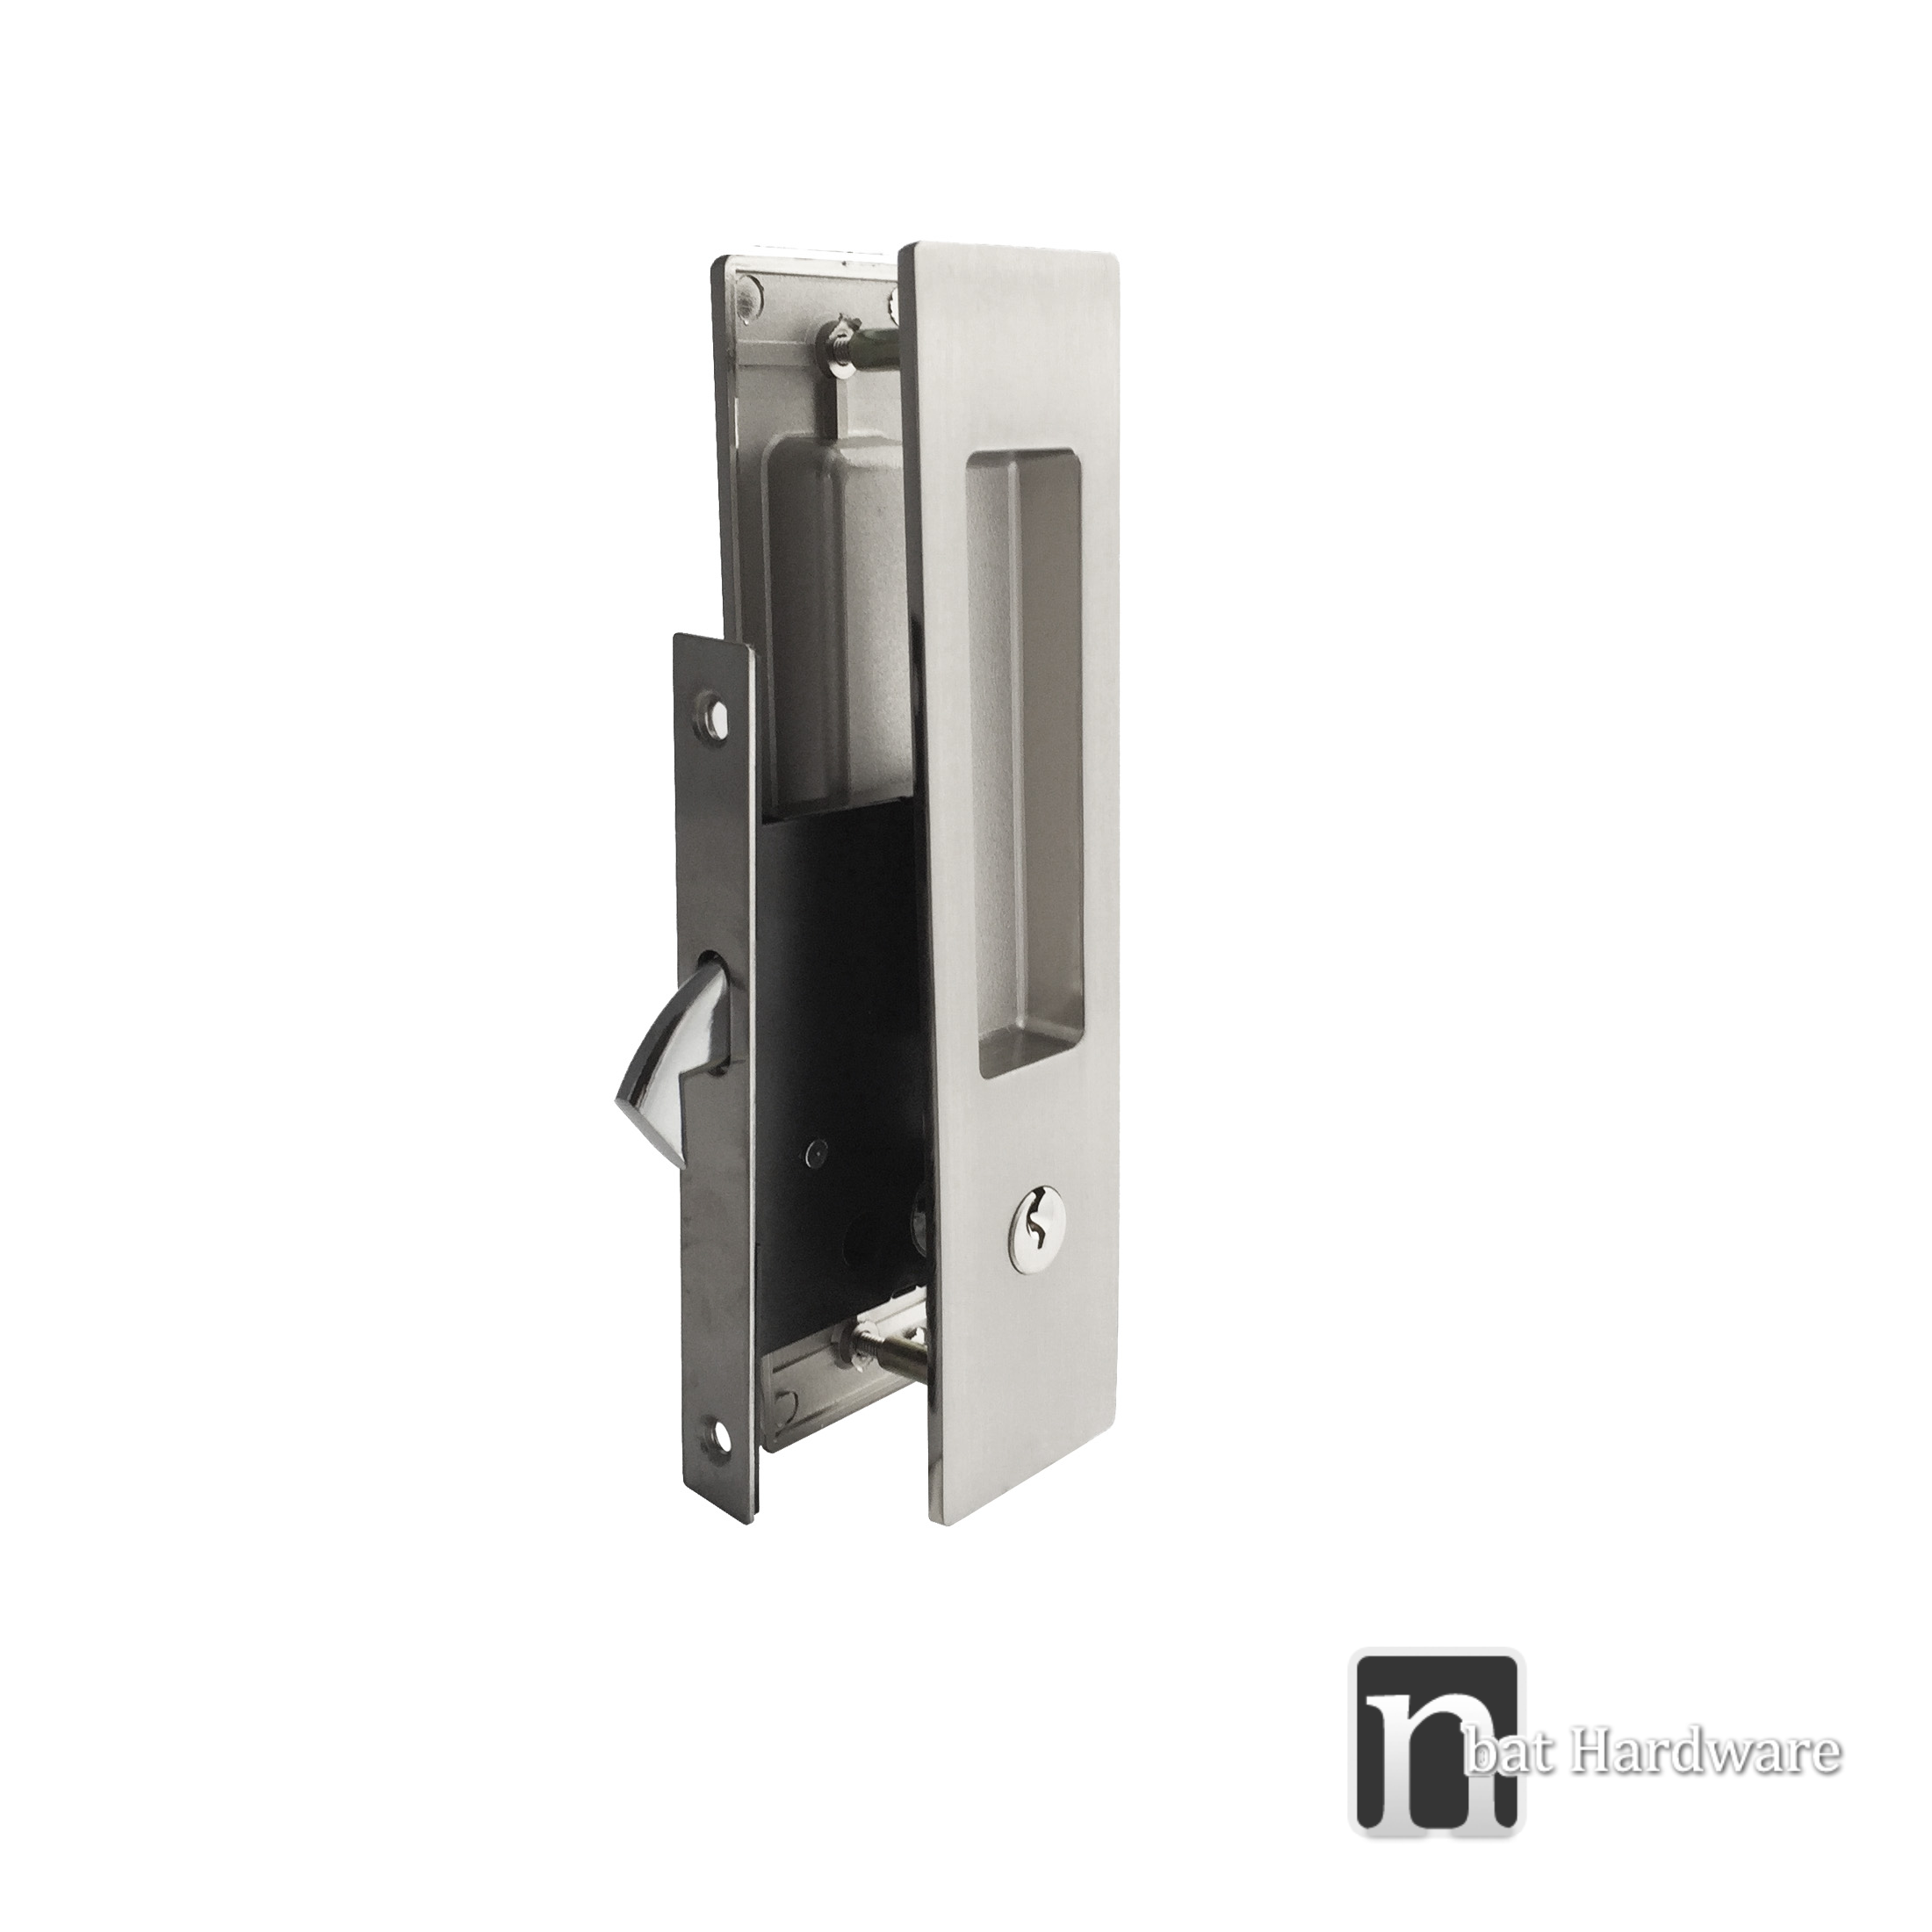 Morgan Series Sliding Door Key Lock Set Nbat Hardware